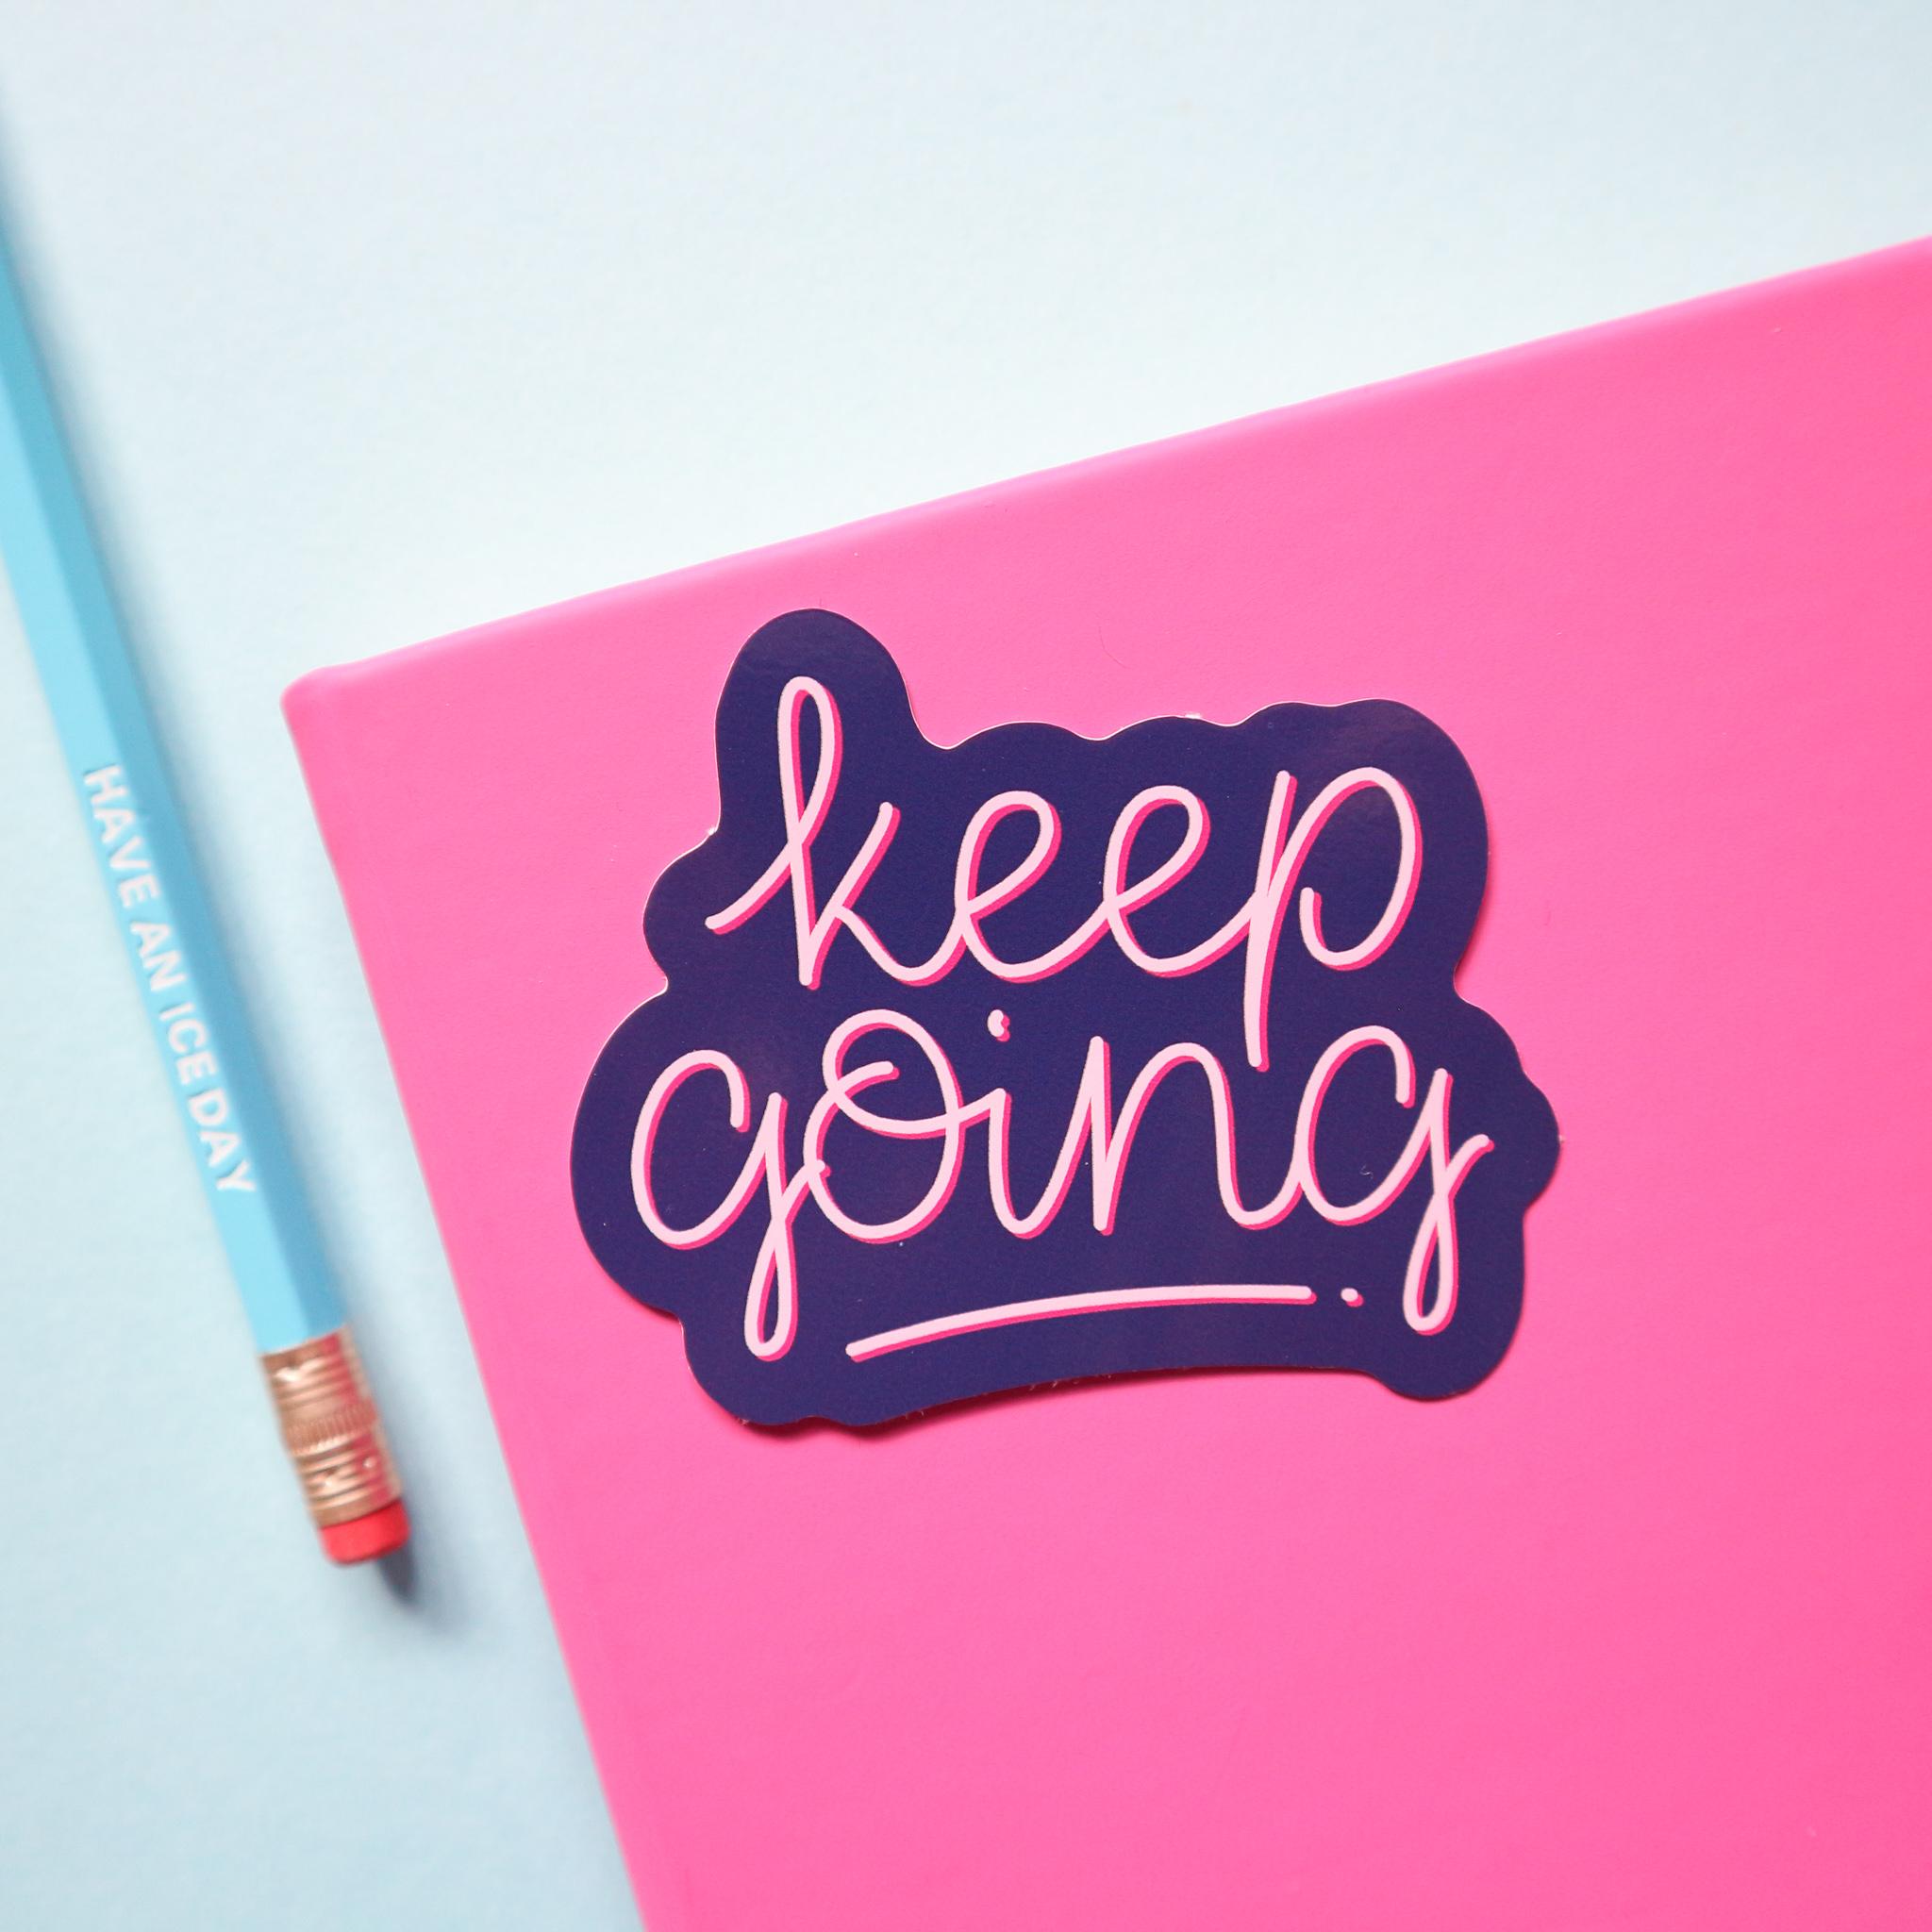 Keep Going Sticker by Sian Shrimpton